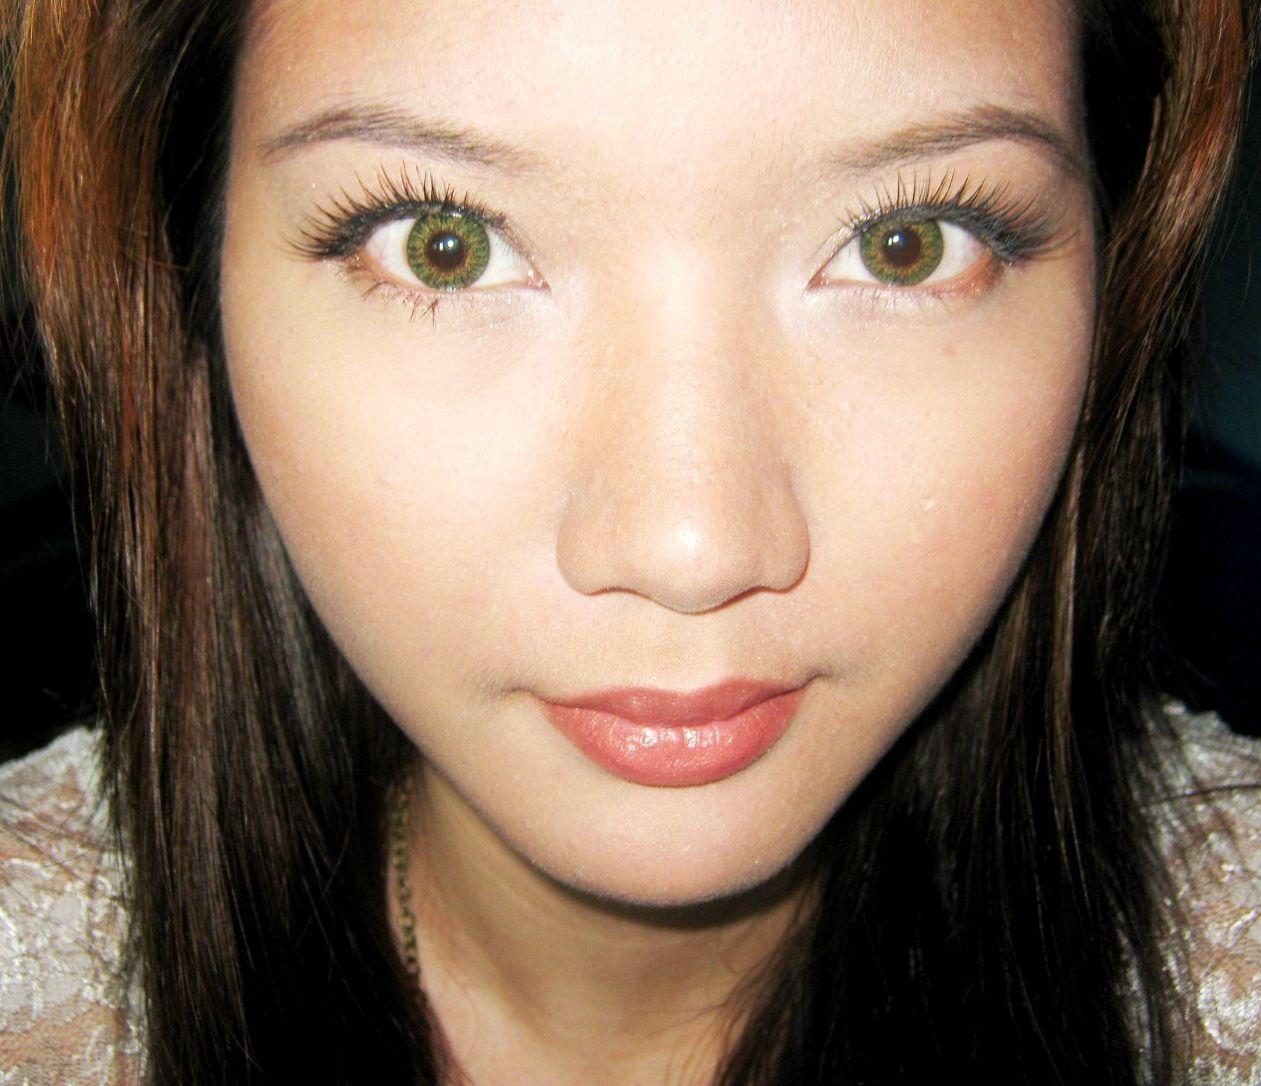 Take A Look At These Fabulous Natural Looking Fake Eyelashes